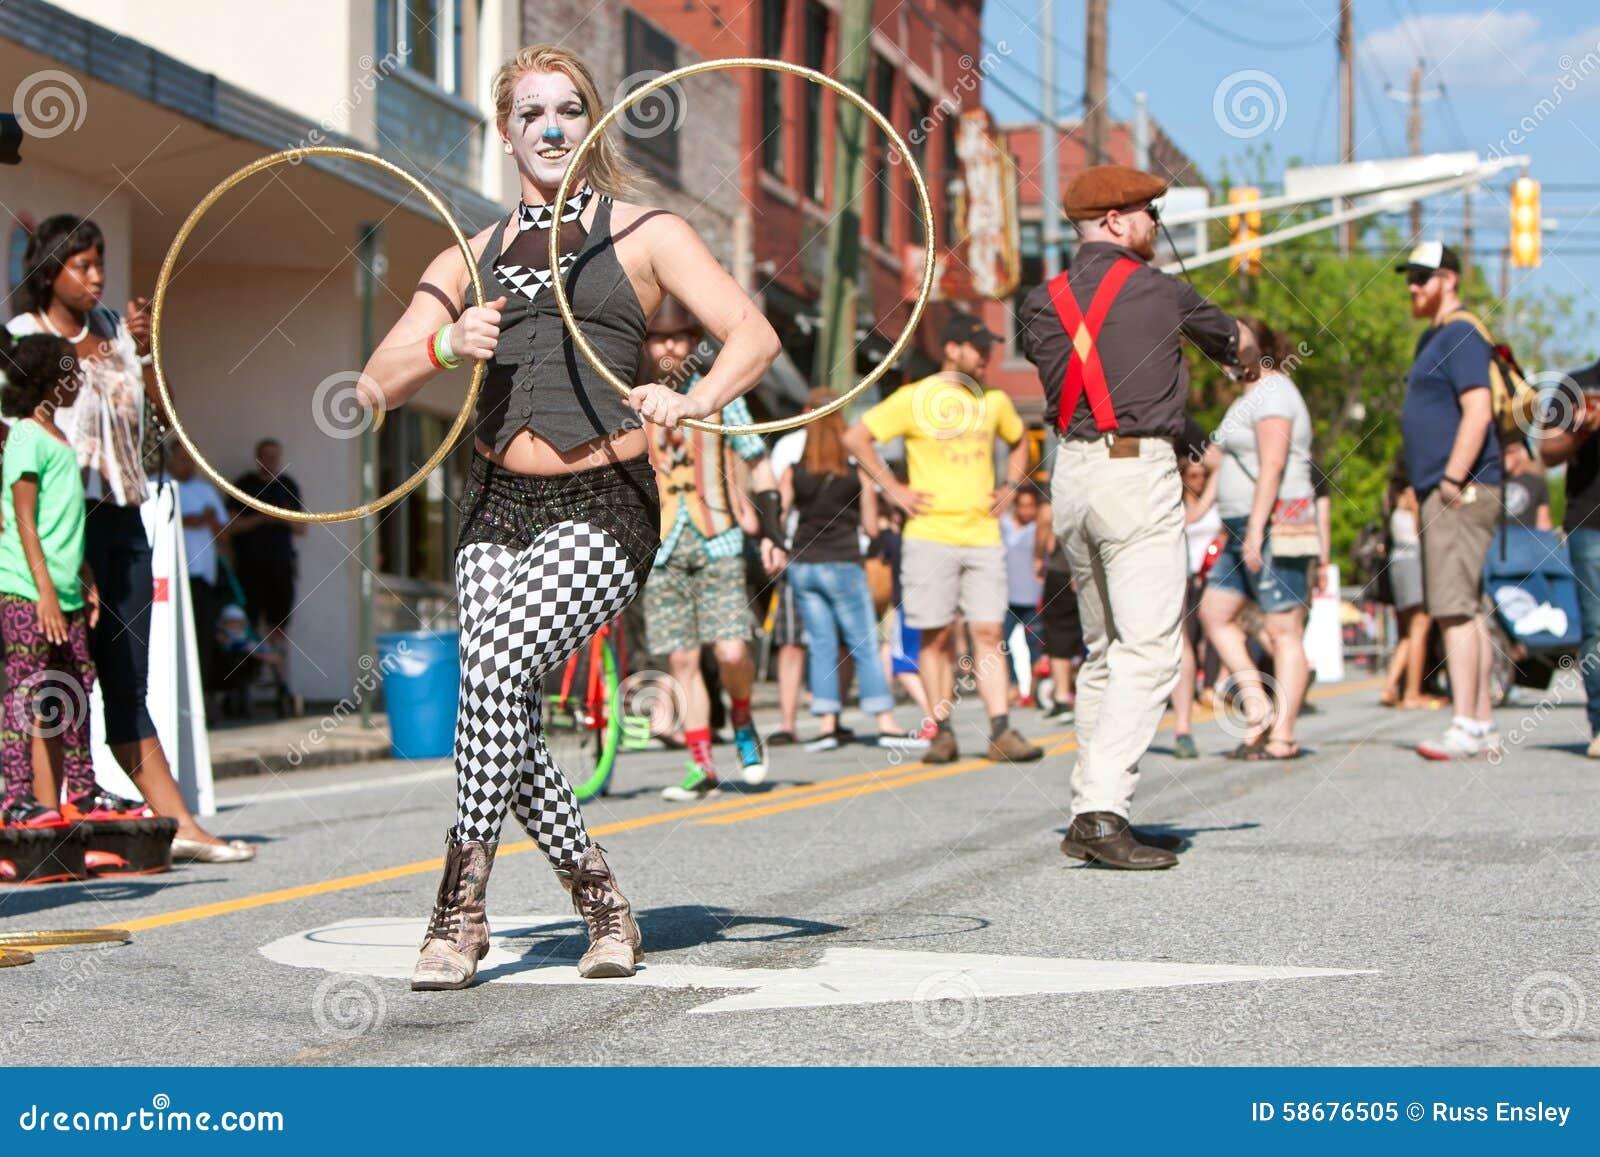 Excellent Transsexual street walkers in atlanta ga opinion, actual